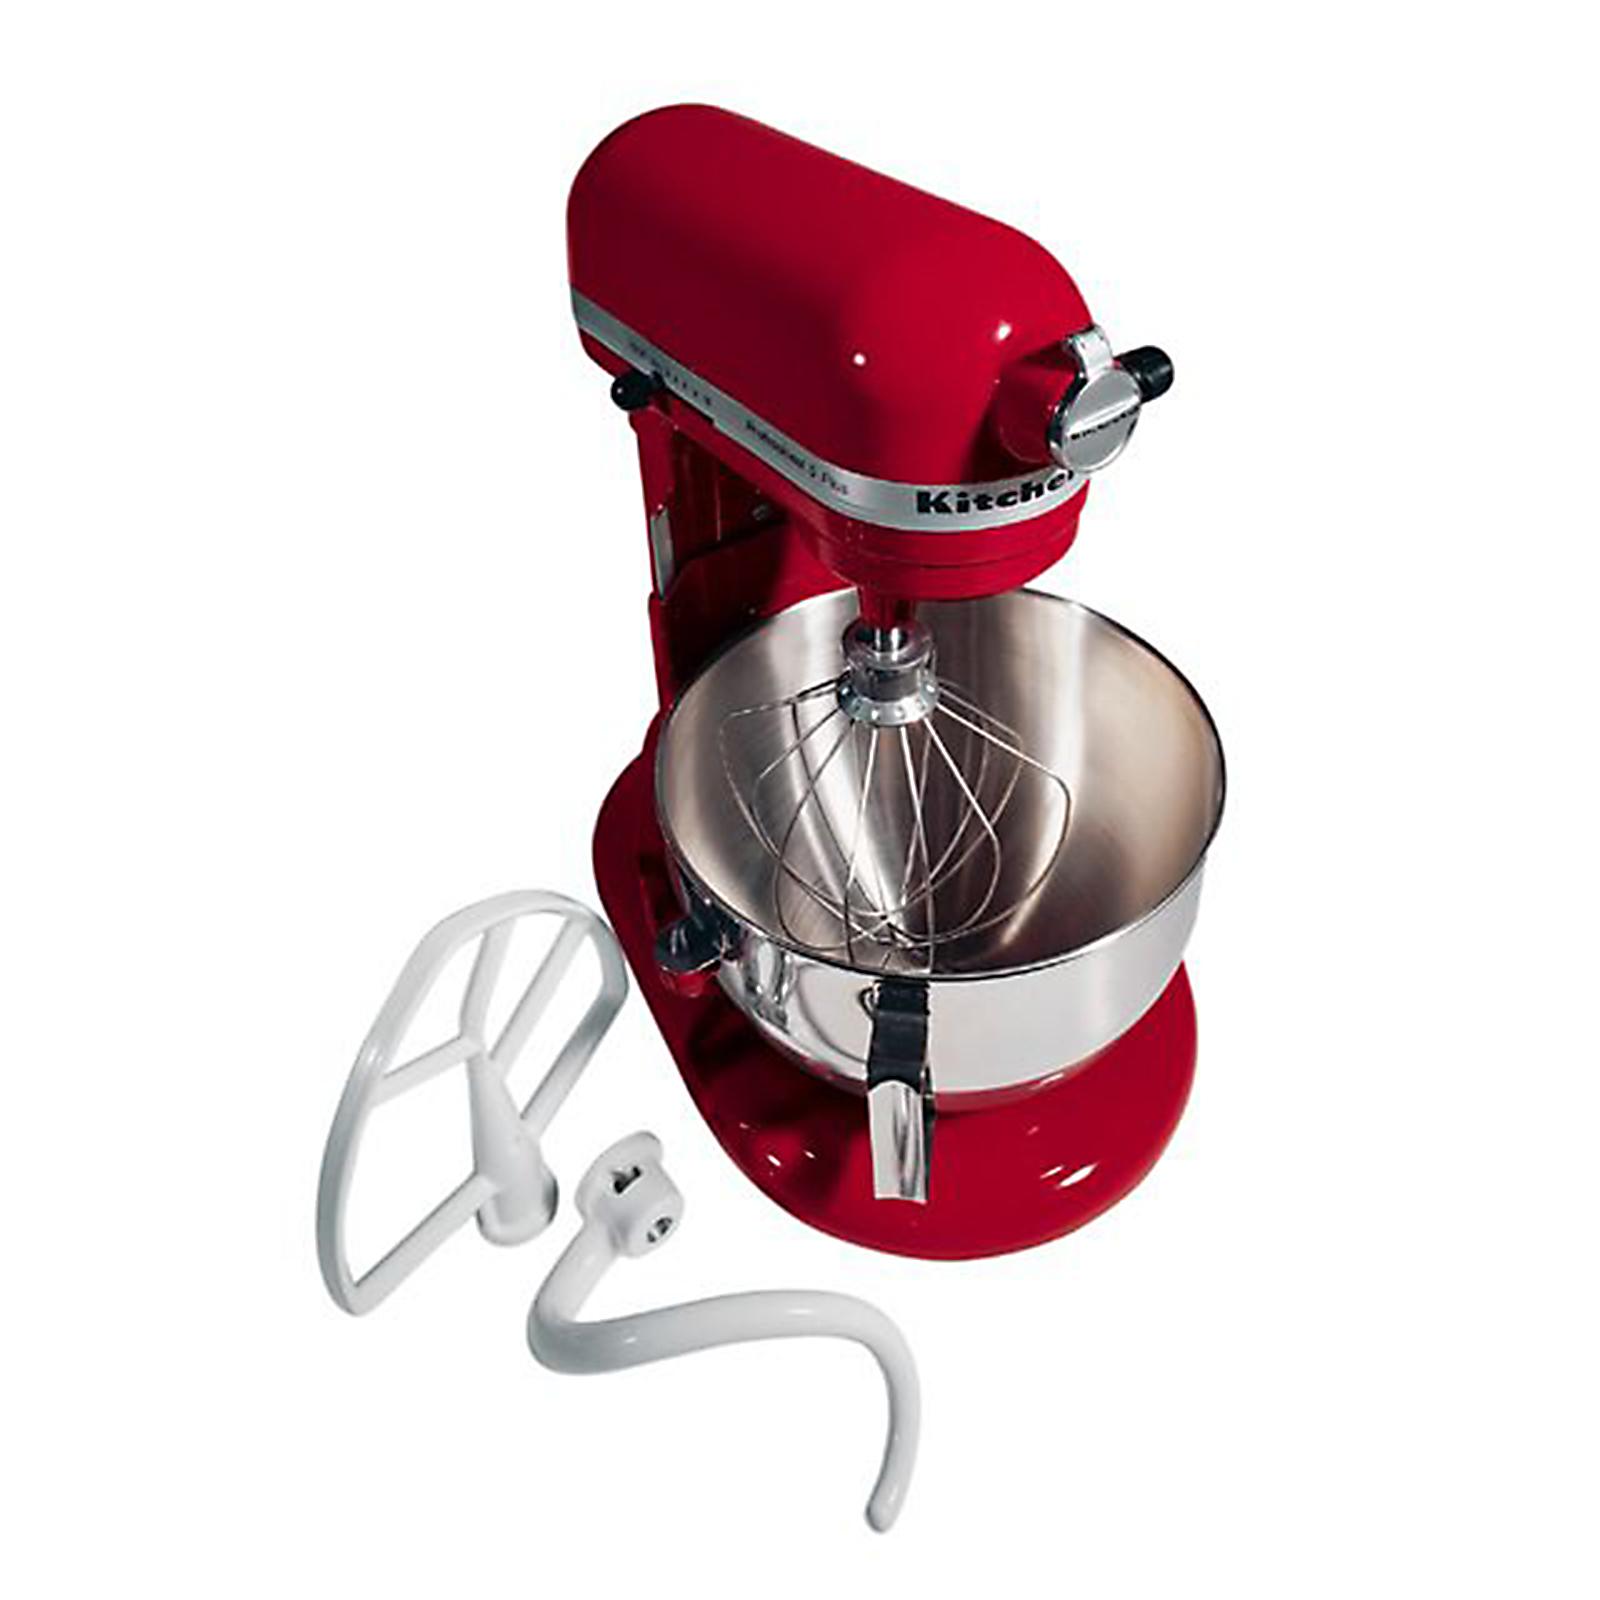 kitchen aid stand up mixer lighting design prod 1698737812 hei333 andwid333 andop sharpen1